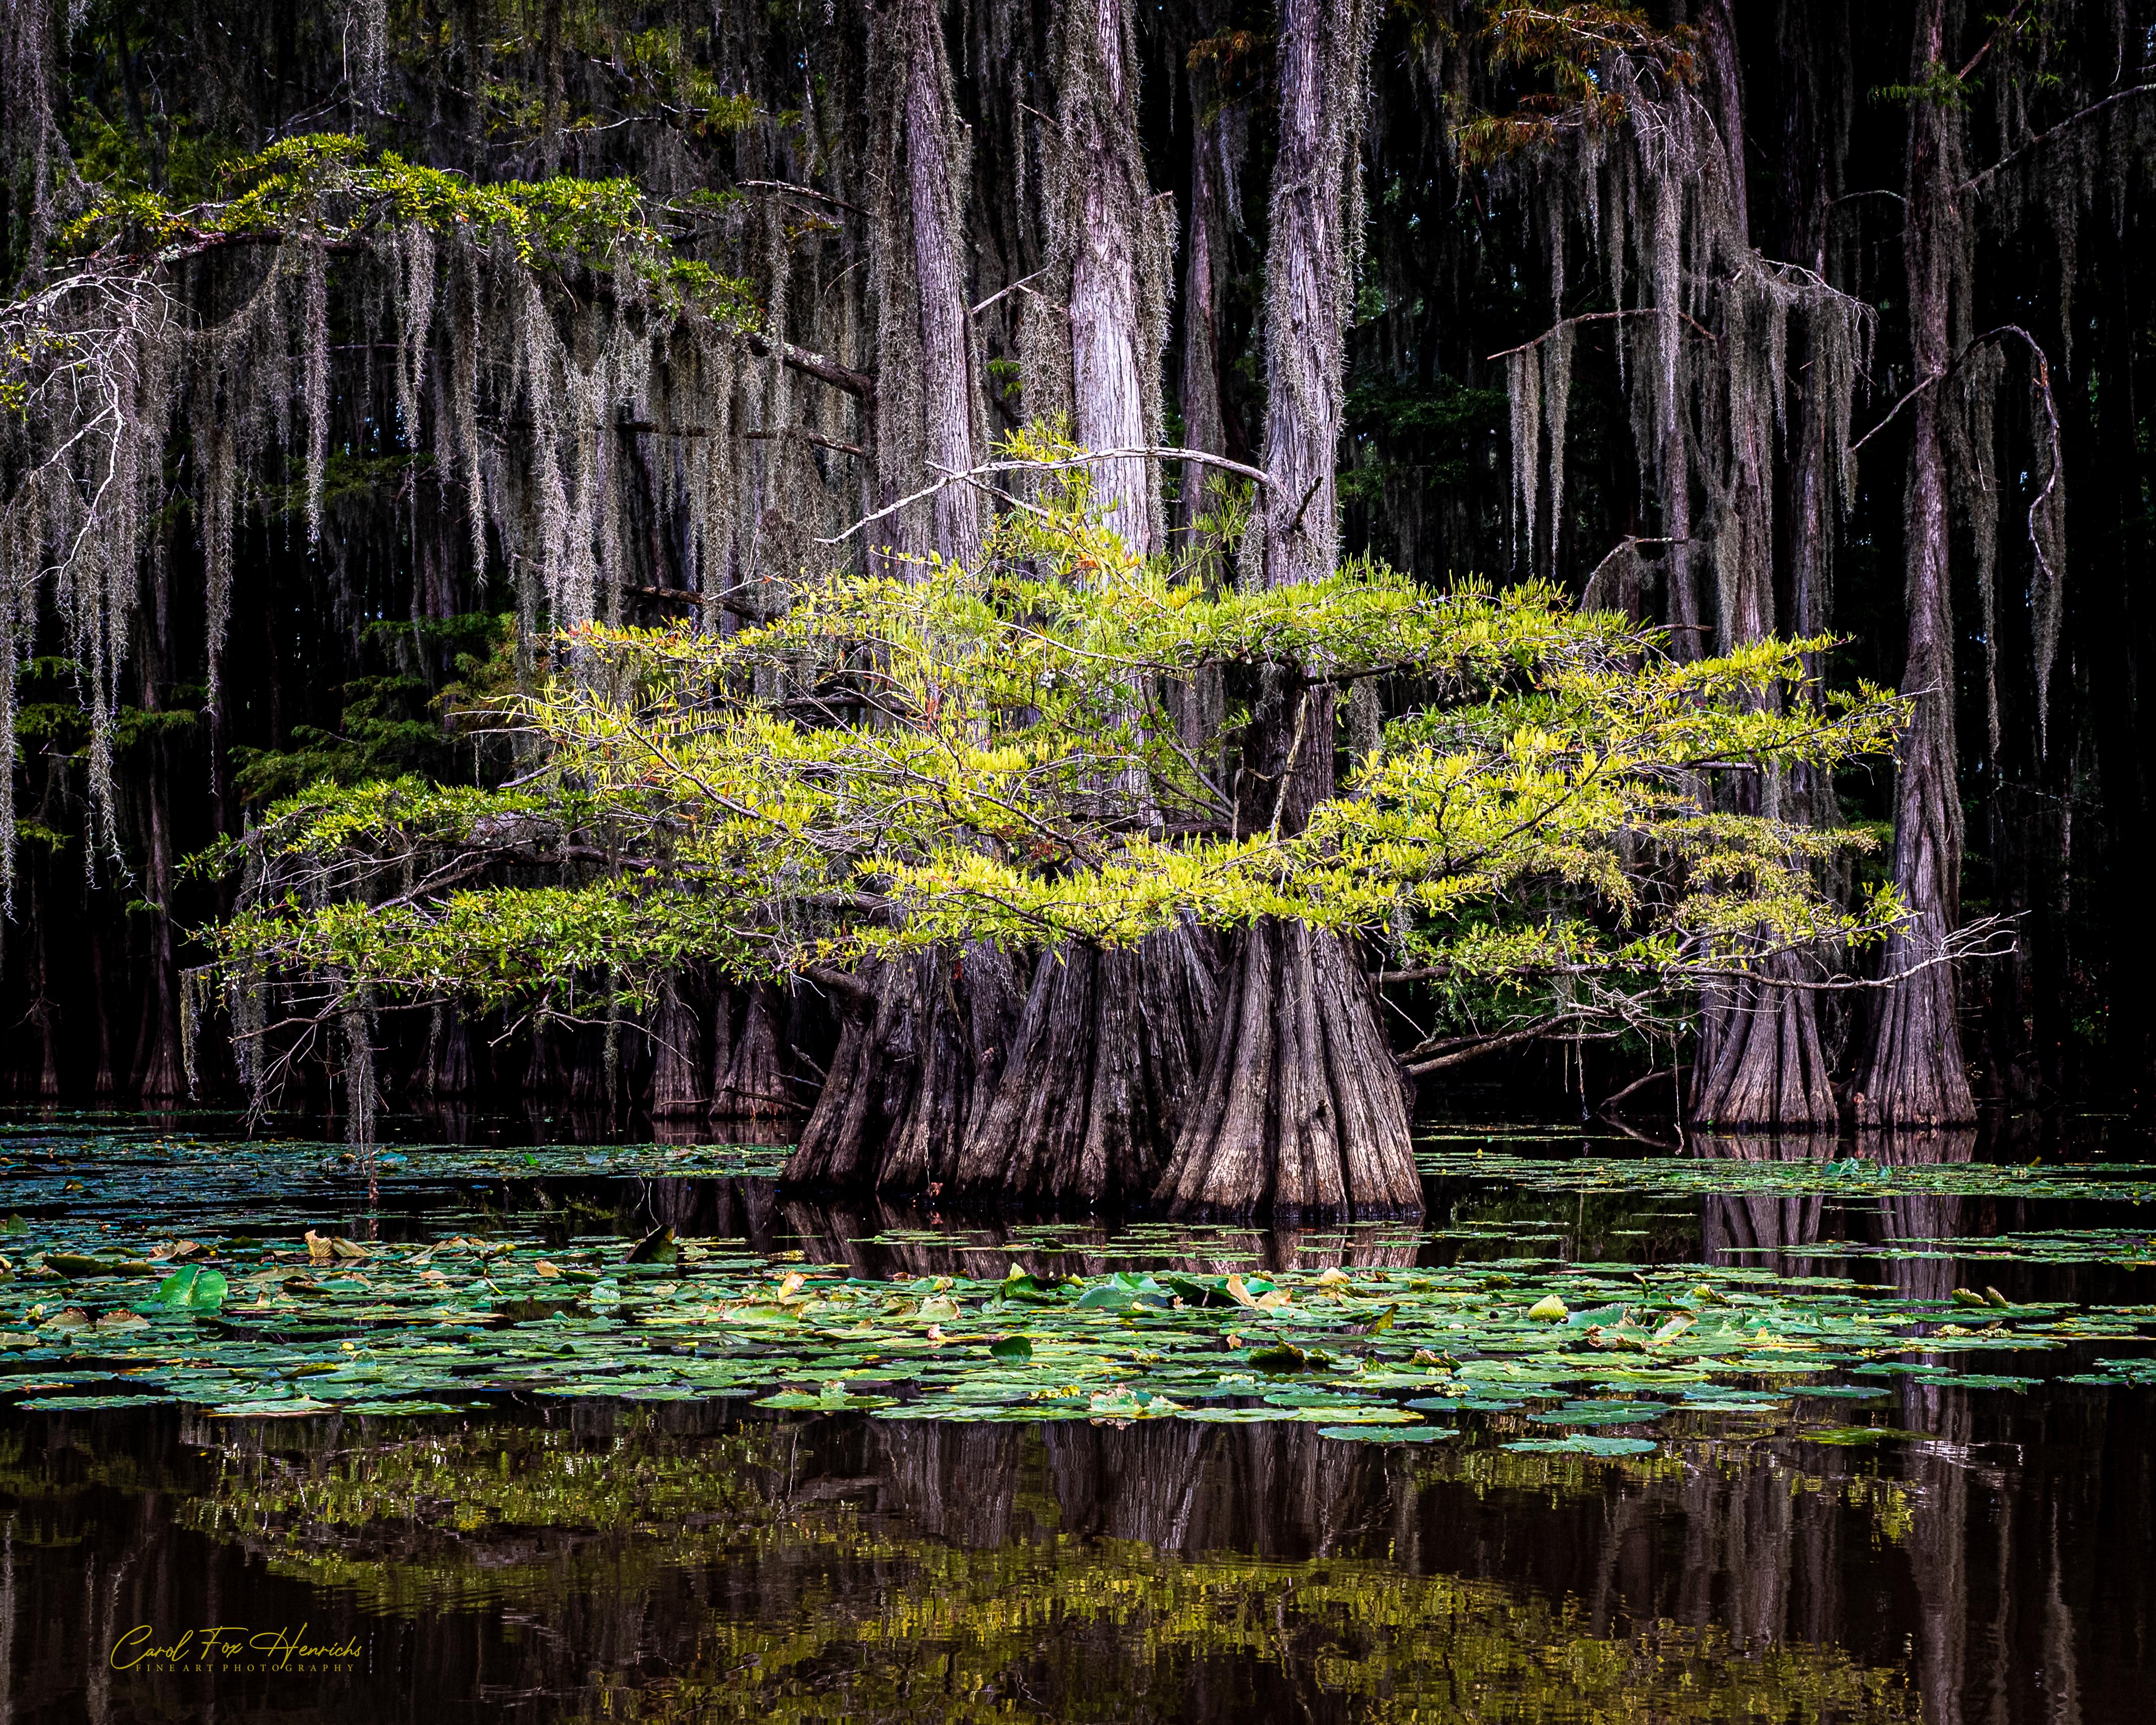 Solitude in the Swamp